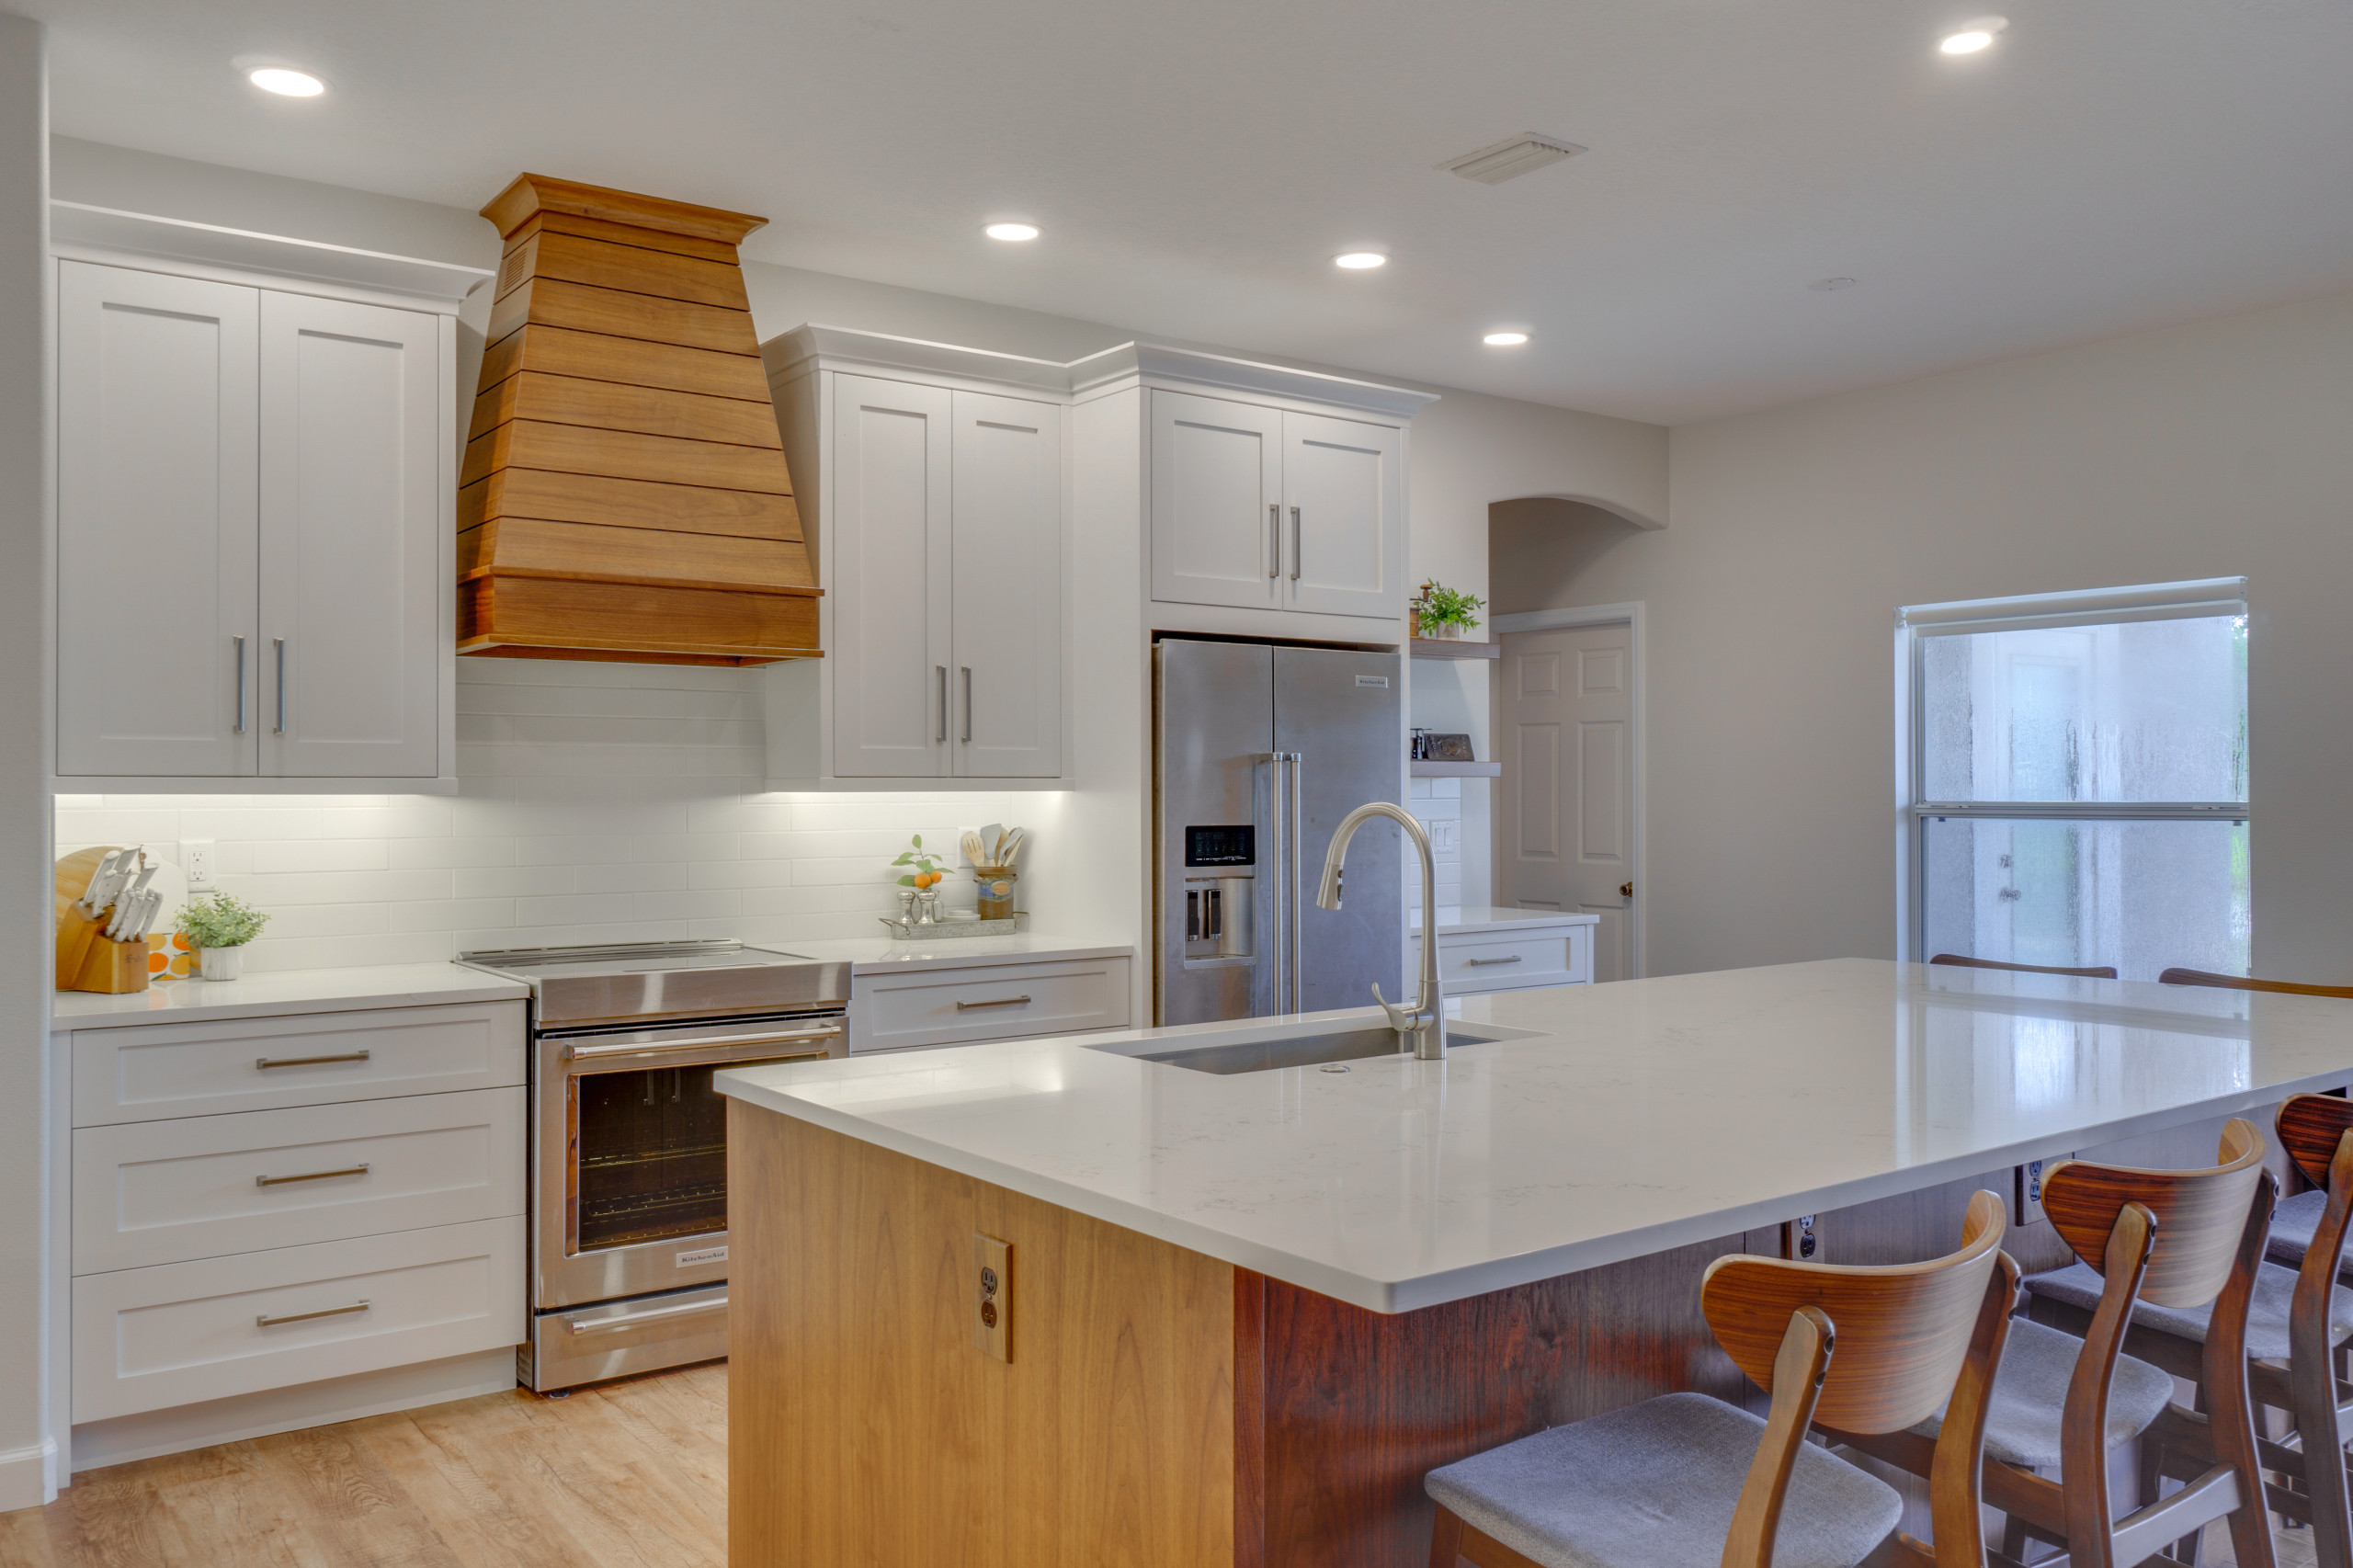 White and Walnut Kitchen Remodel